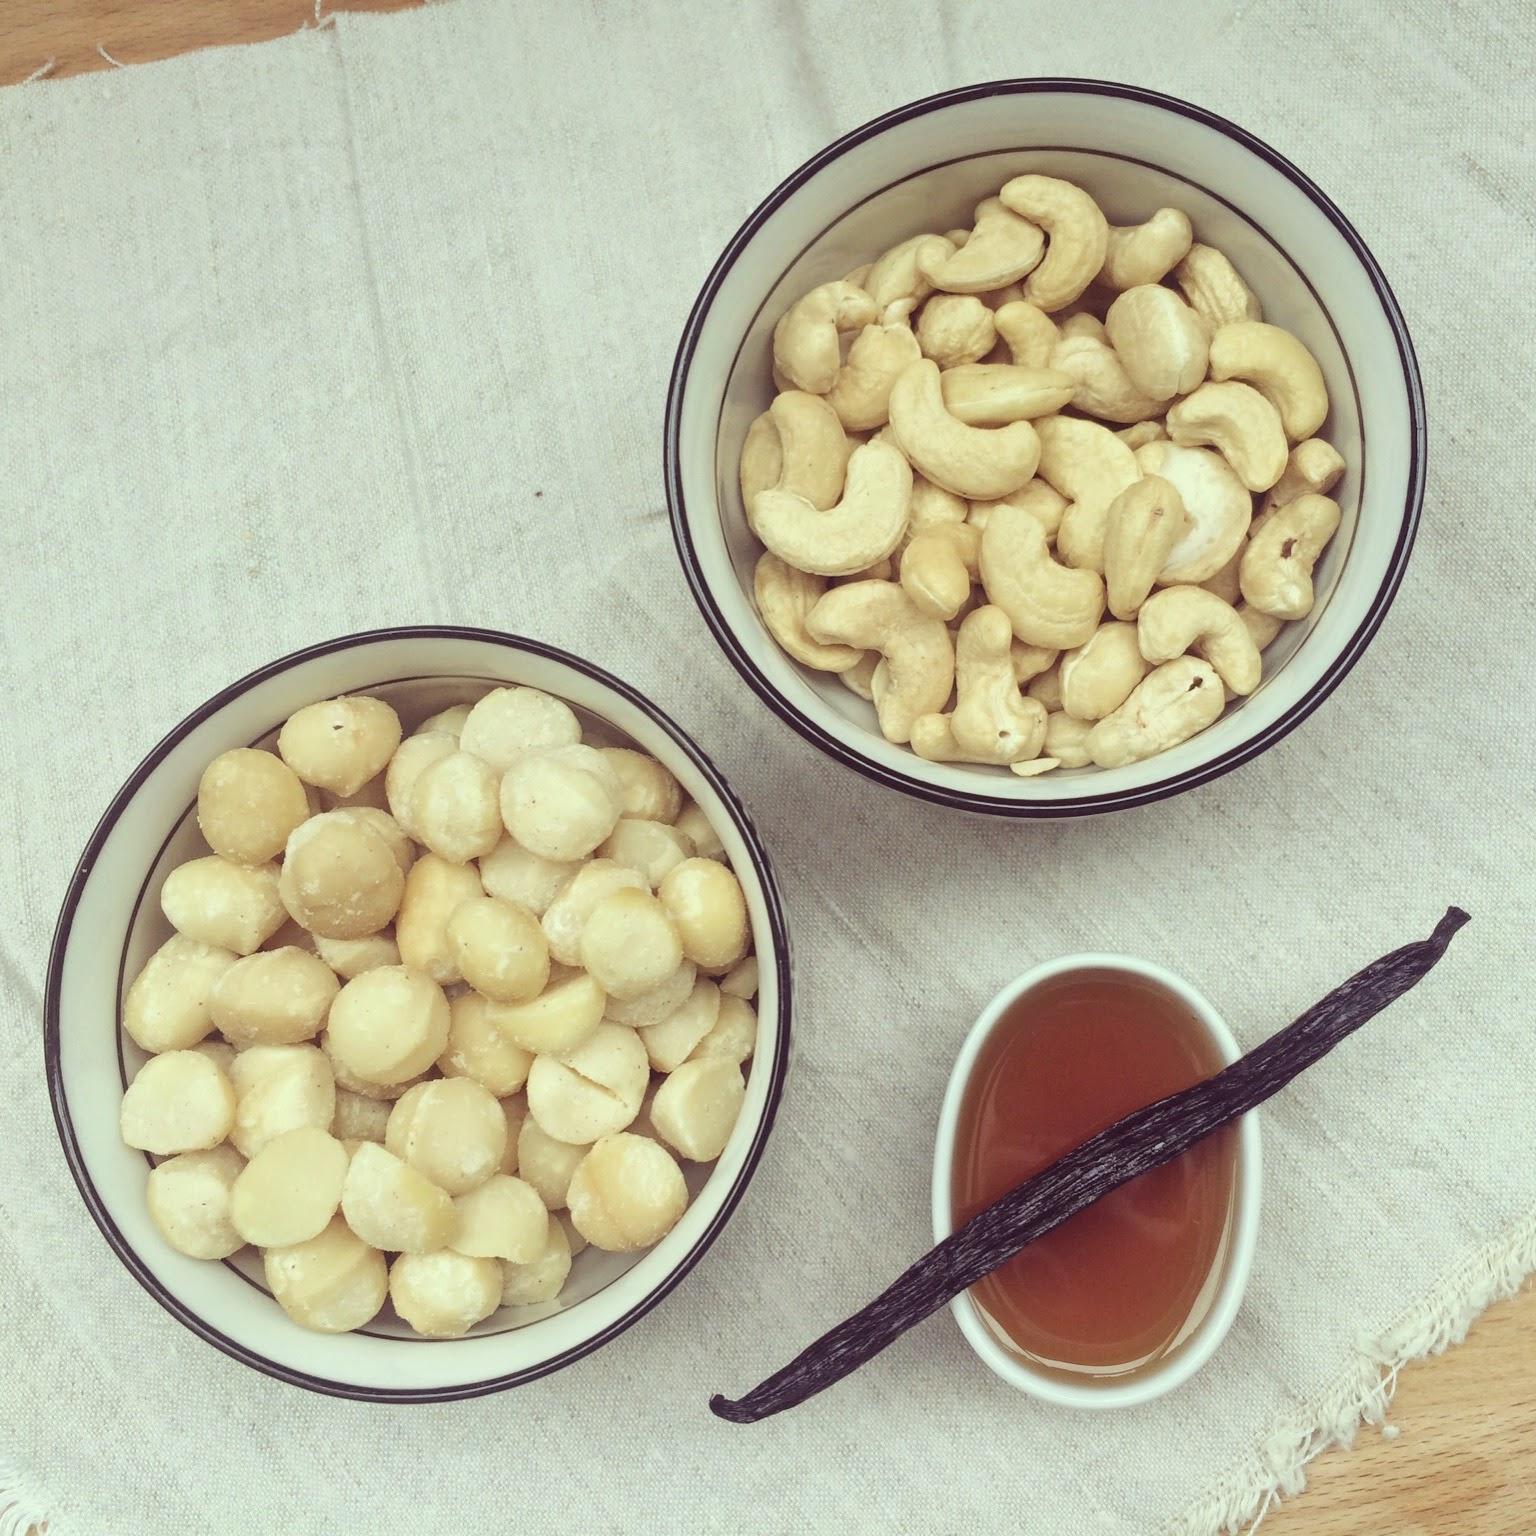 beurre macadamia cajou vanille érable